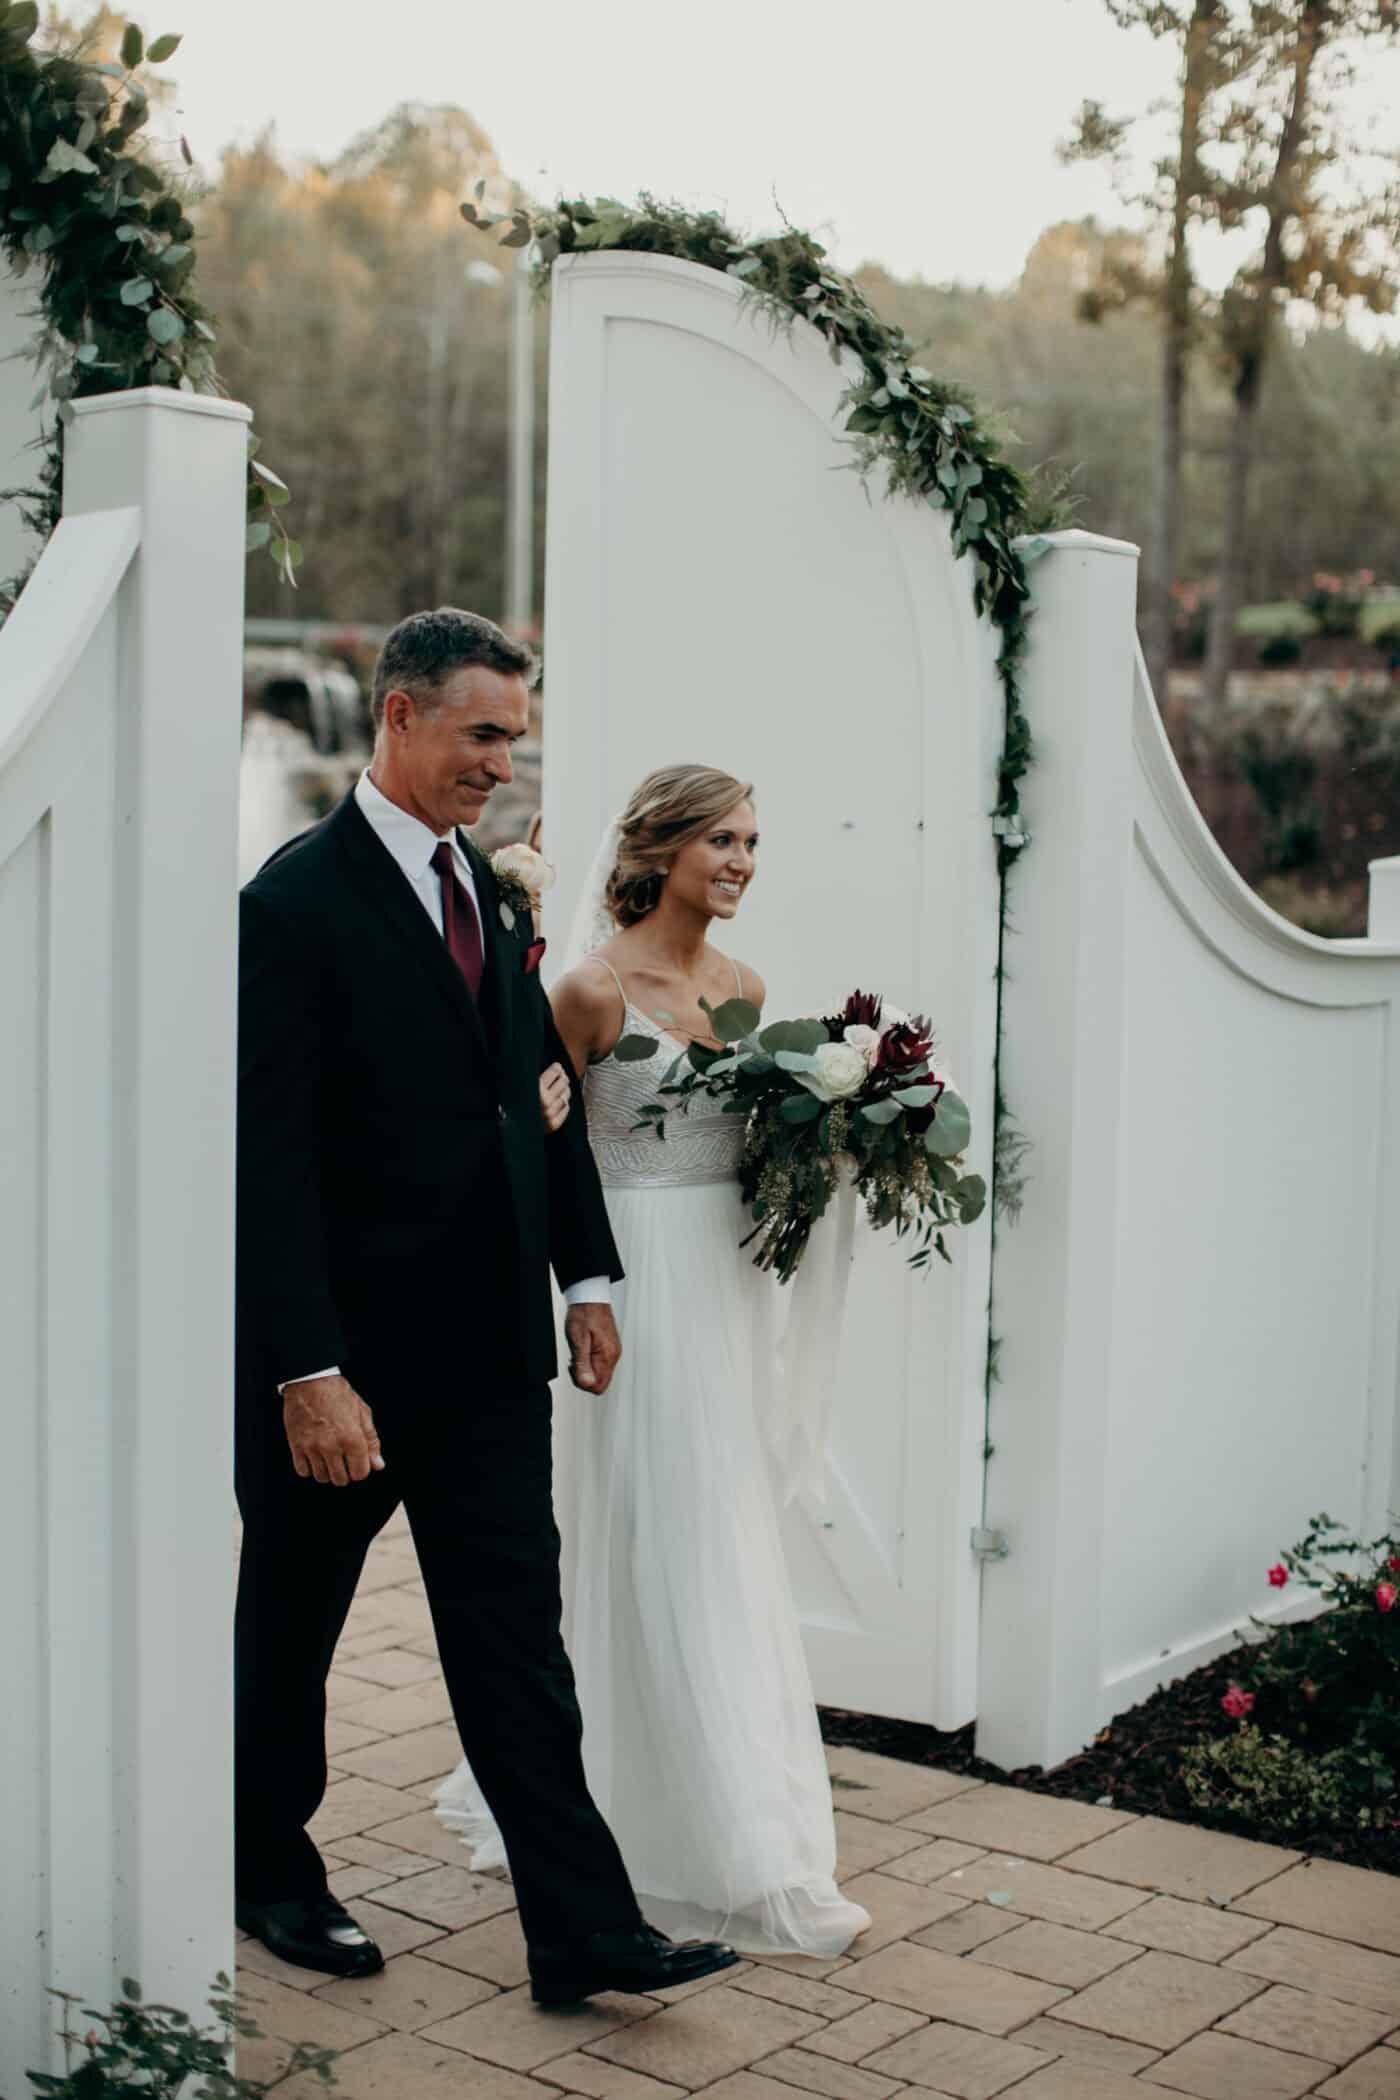 Selecting Your Virginia Wedding Venue | Entwined Events | Venue: Bella Rose Plantation in Lynchburg, VA | Photo Credit: Joe + Kathrina Photography